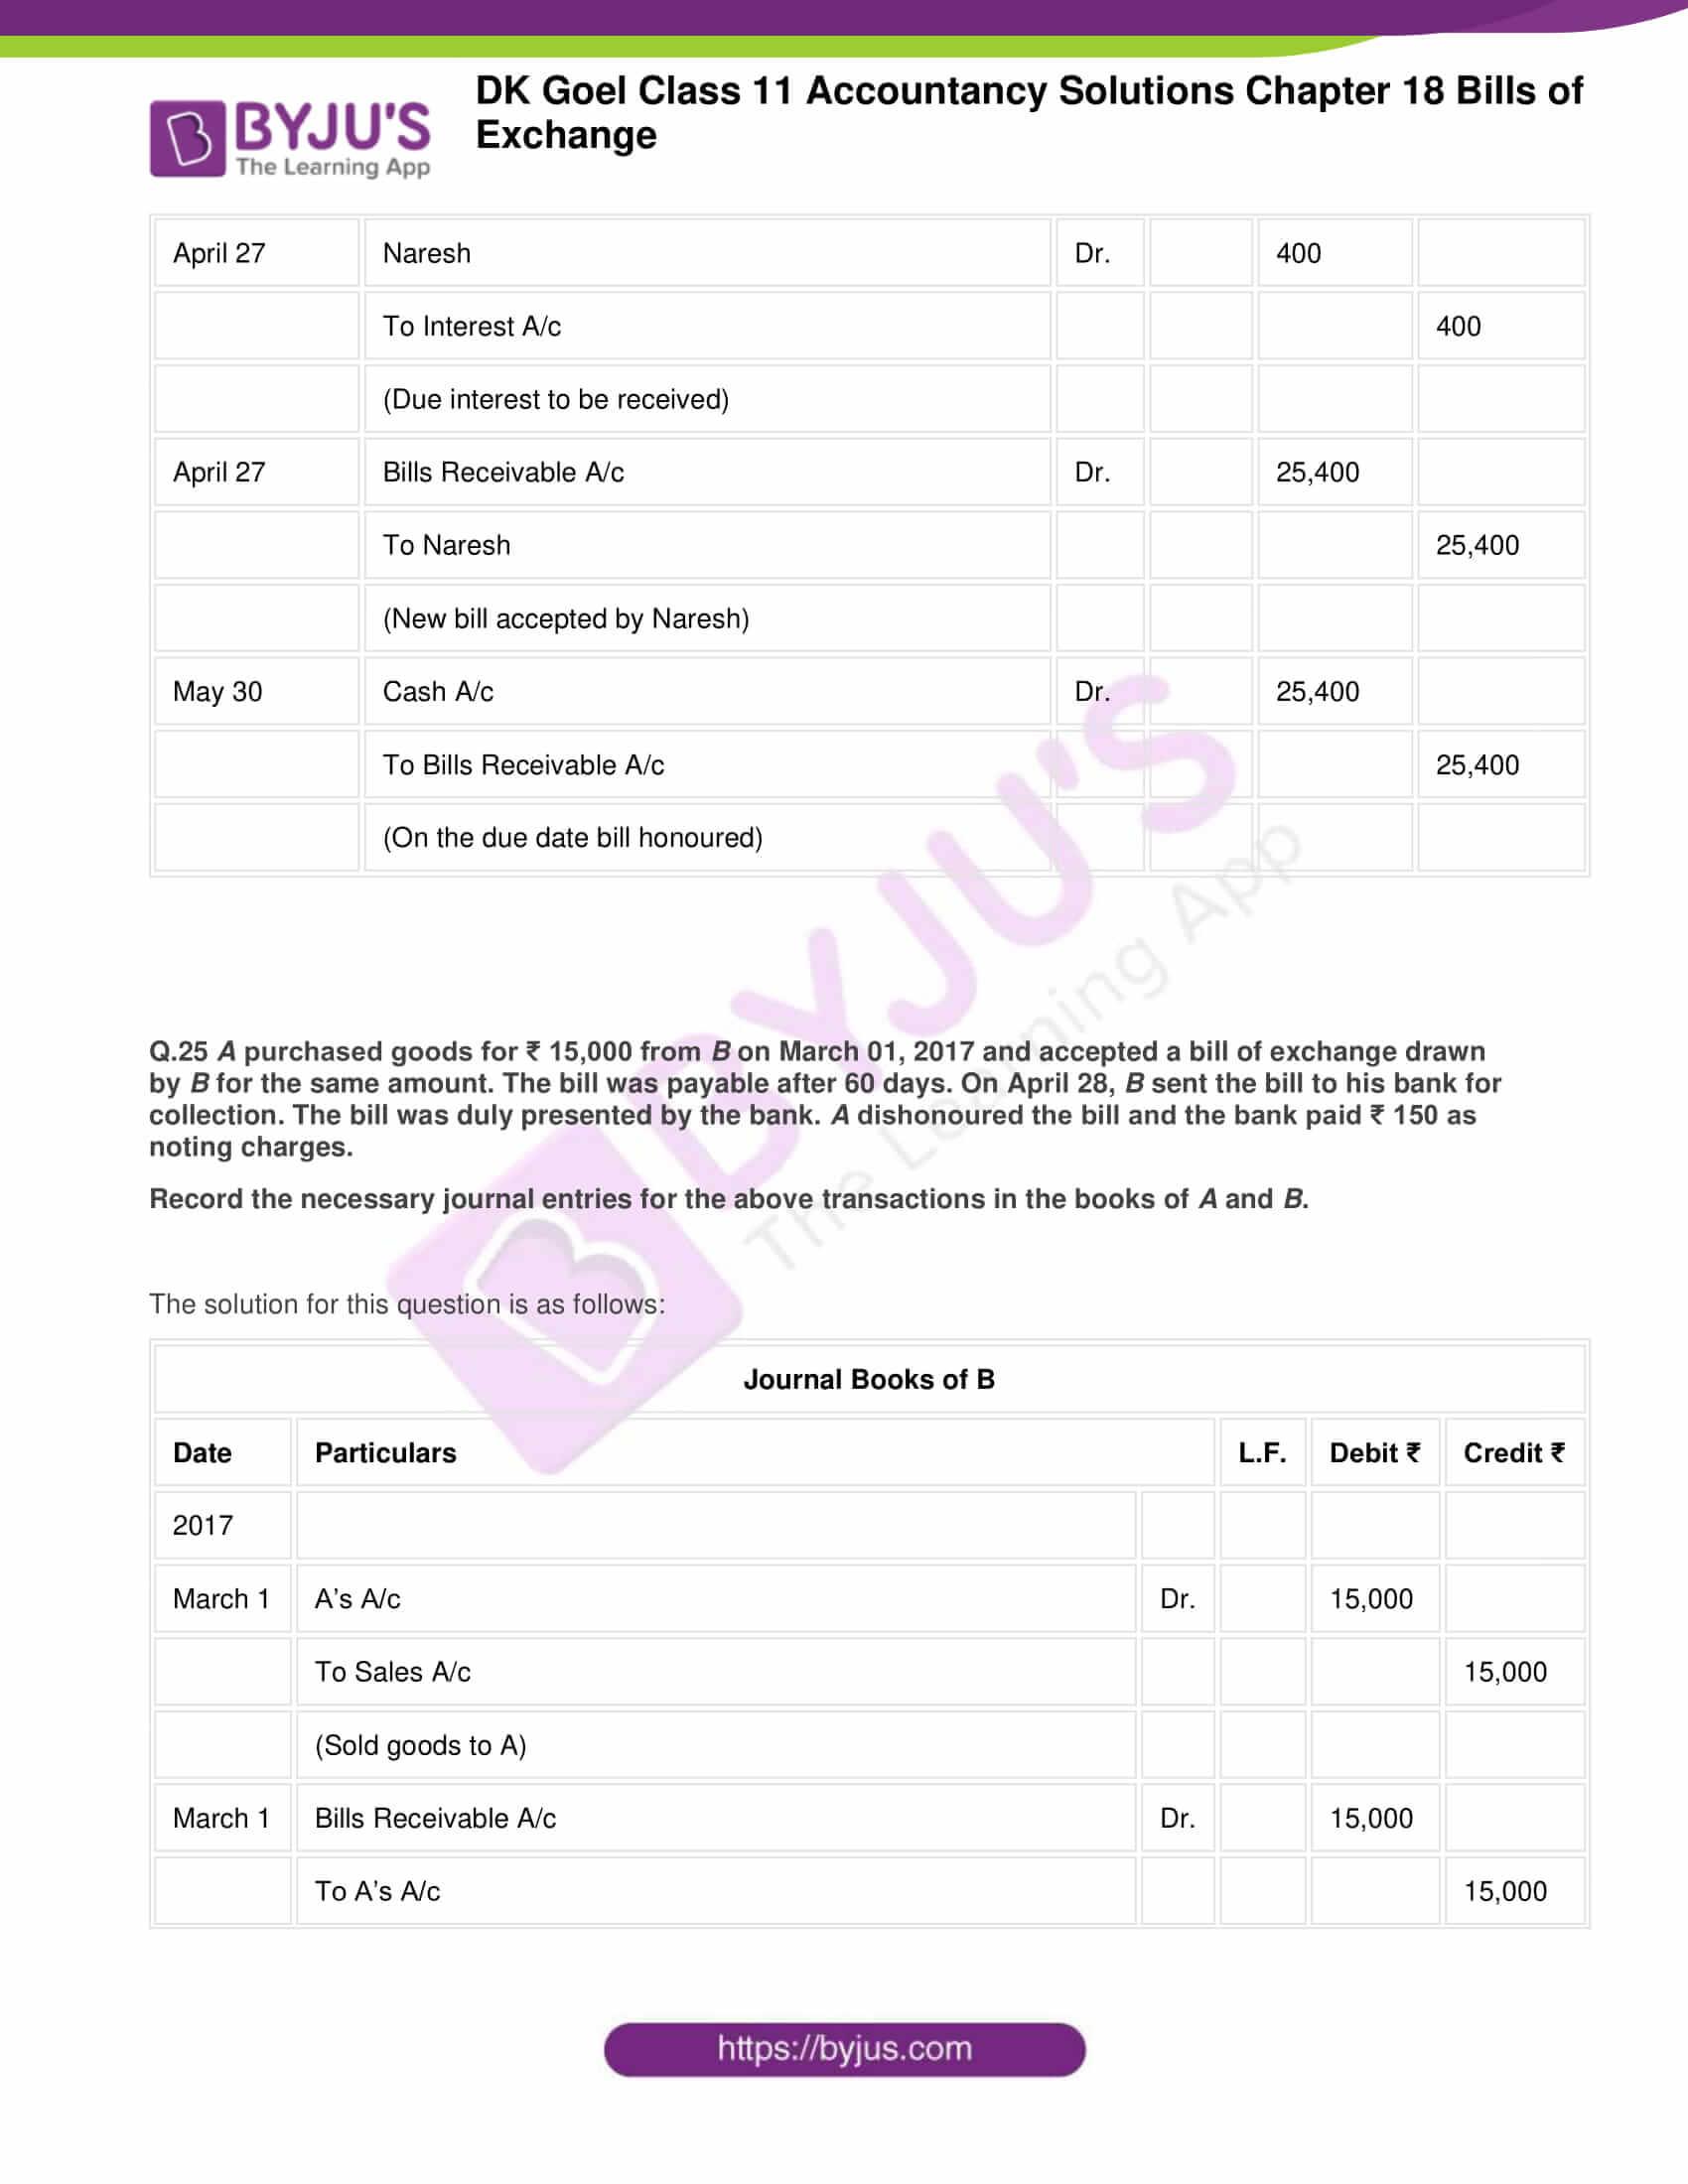 dk goel class 11 accountancy solutions chapter 18 060